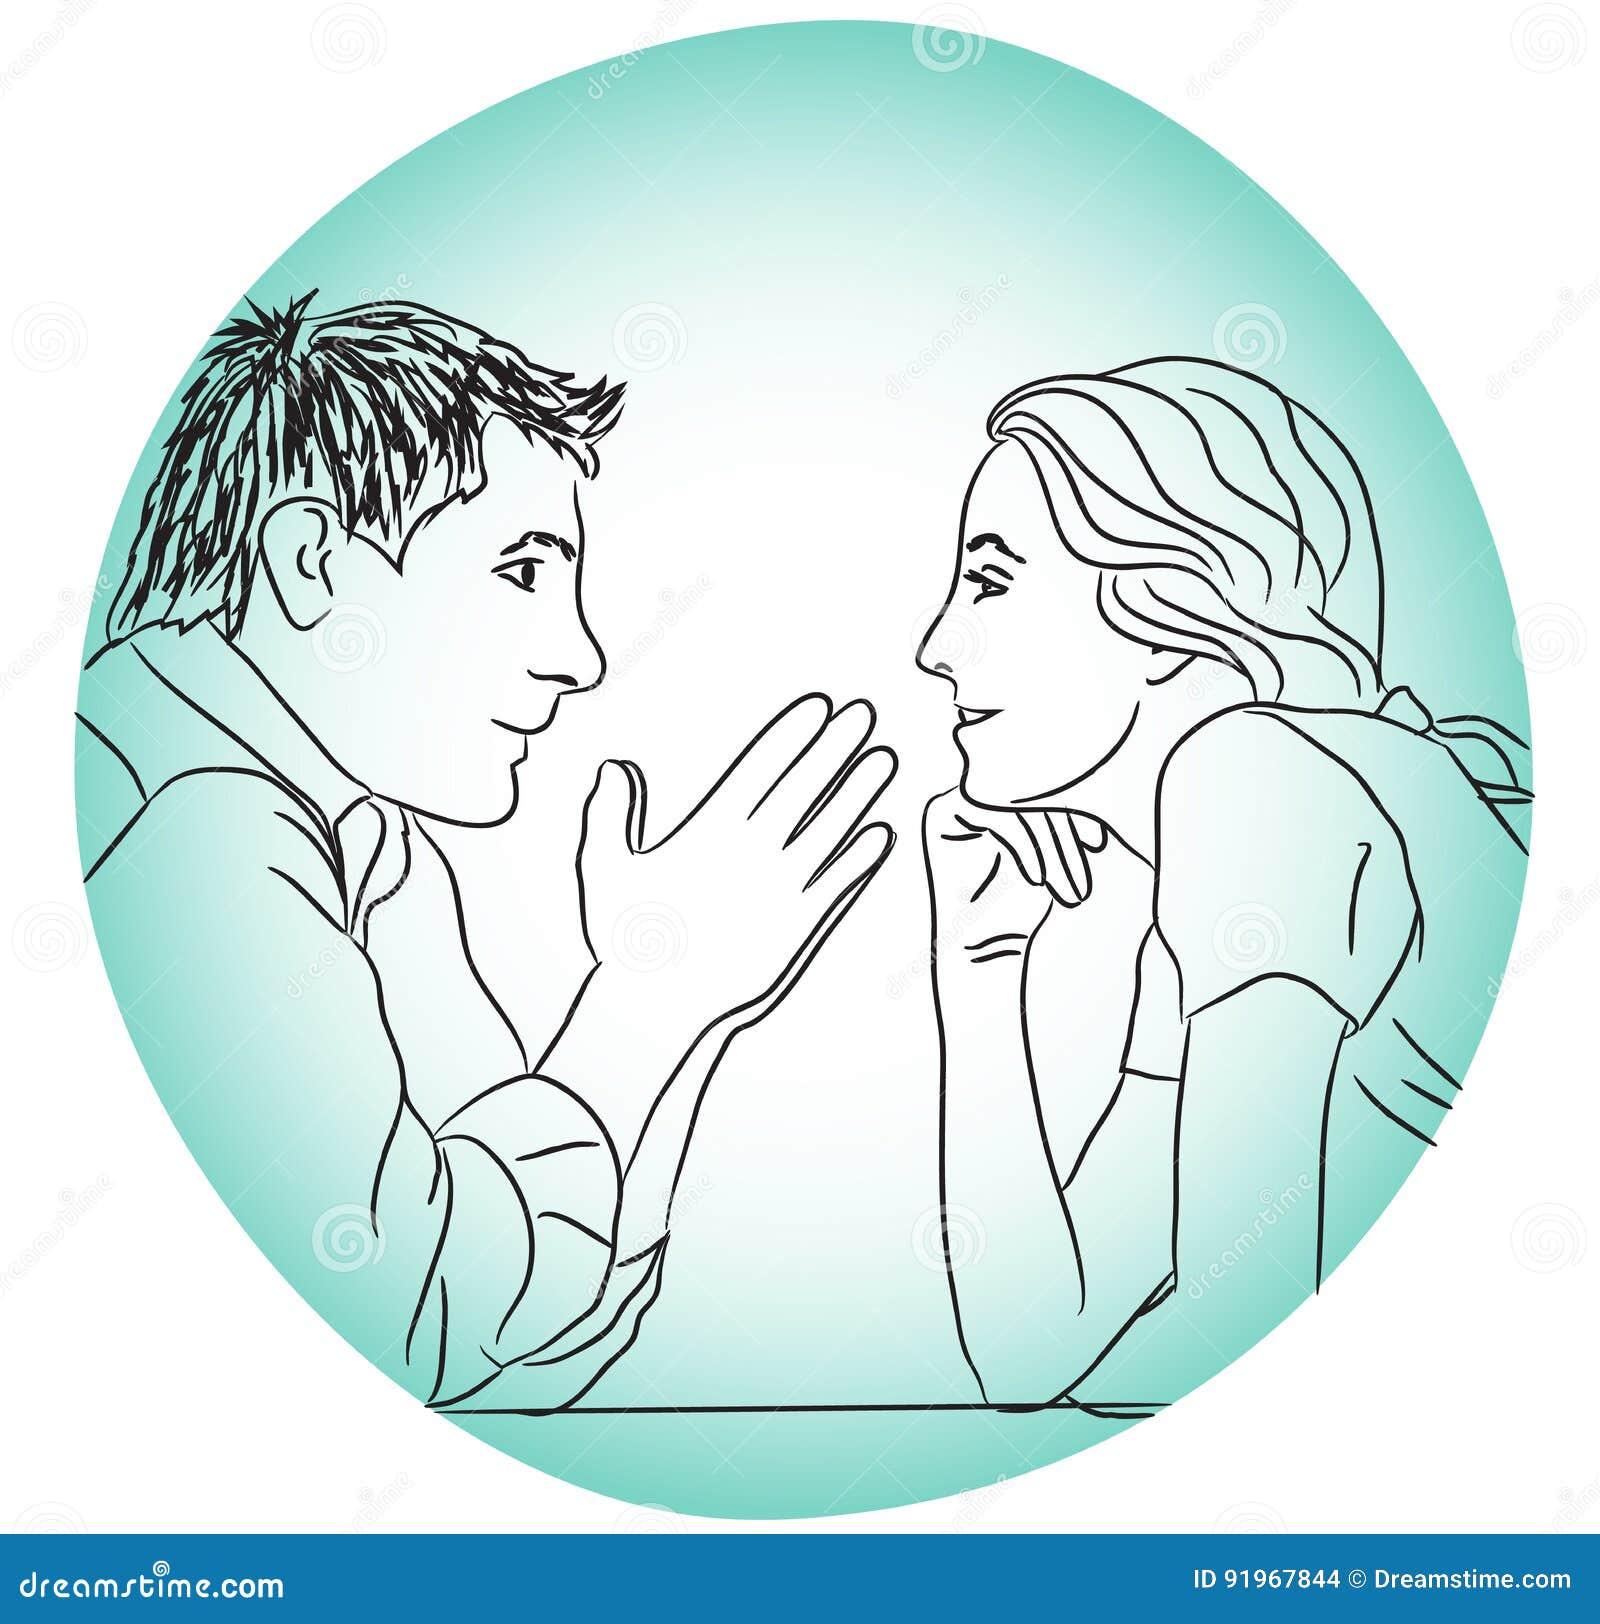 règles de datation Senior Ouganda célibataire datant